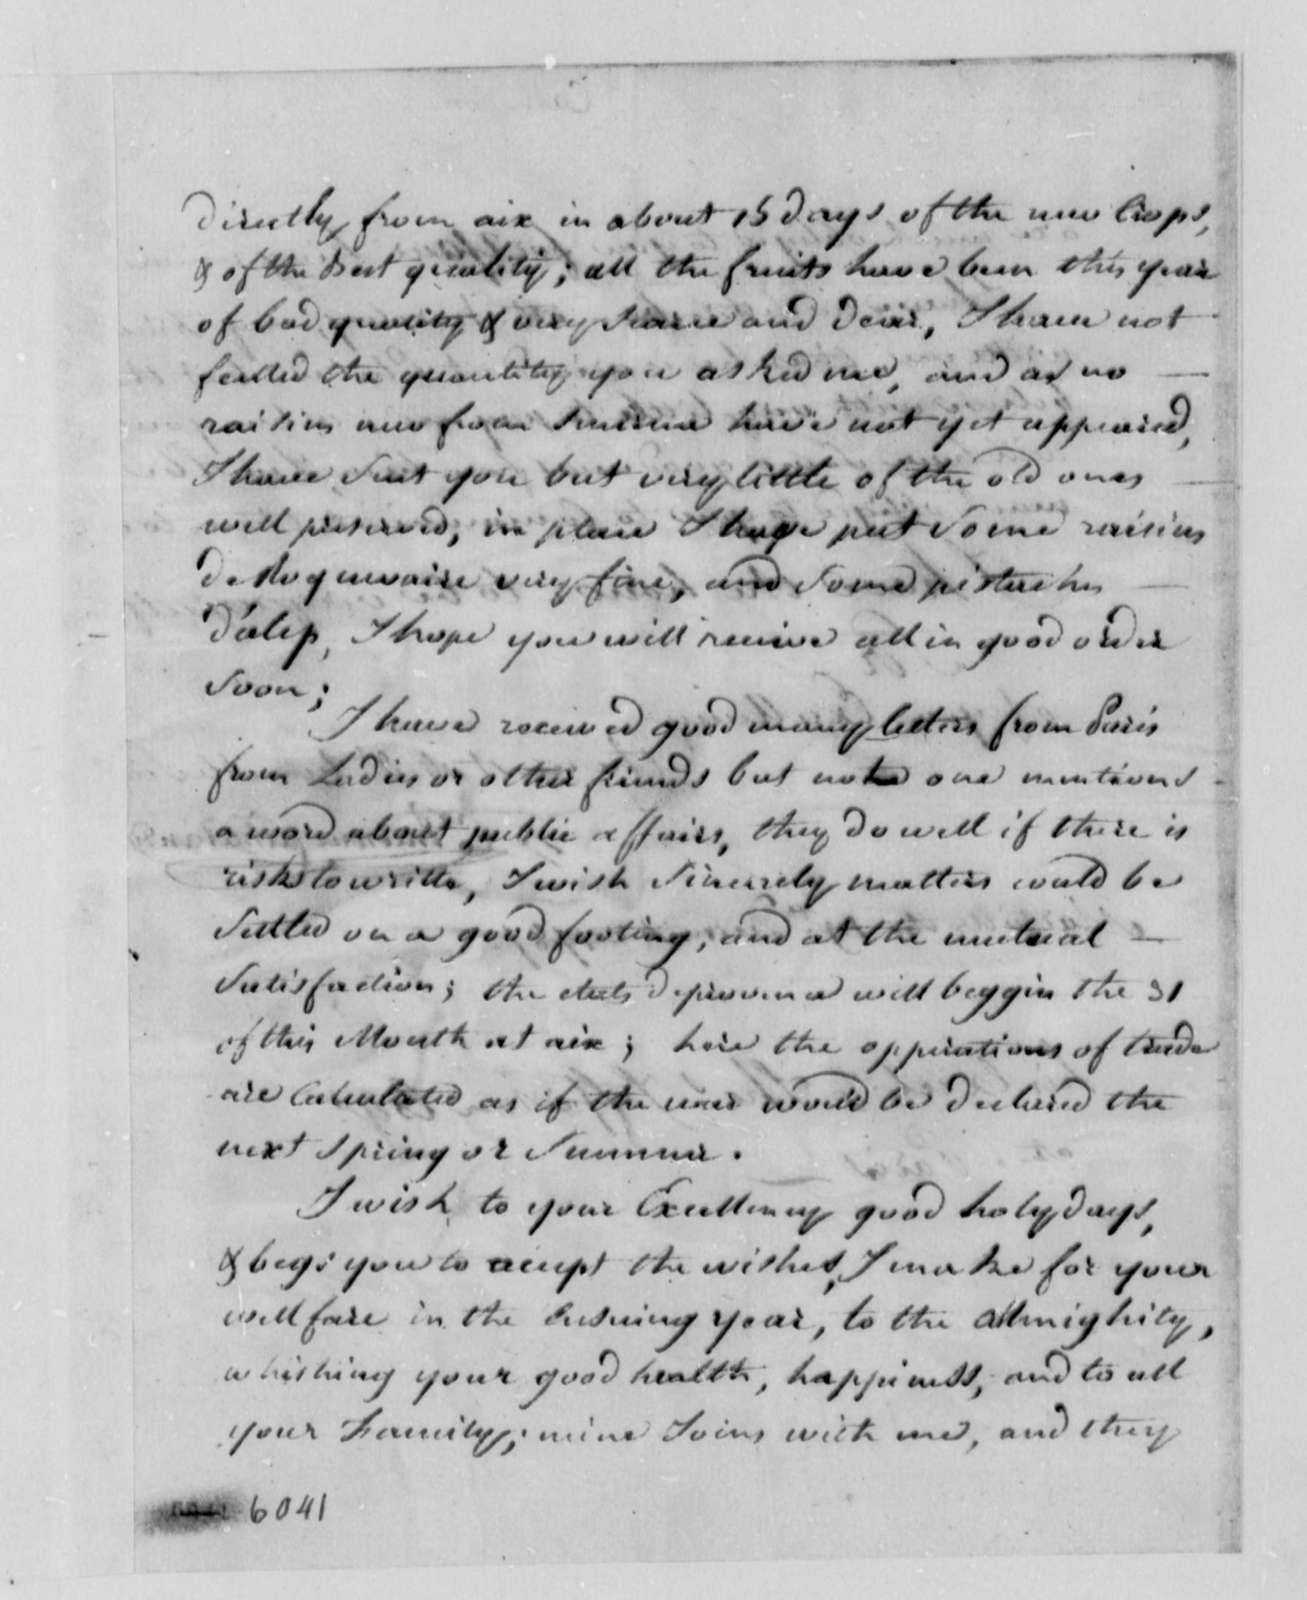 Stephen Cathalan, Sr. to Thomas Jefferson, December 19, 1787